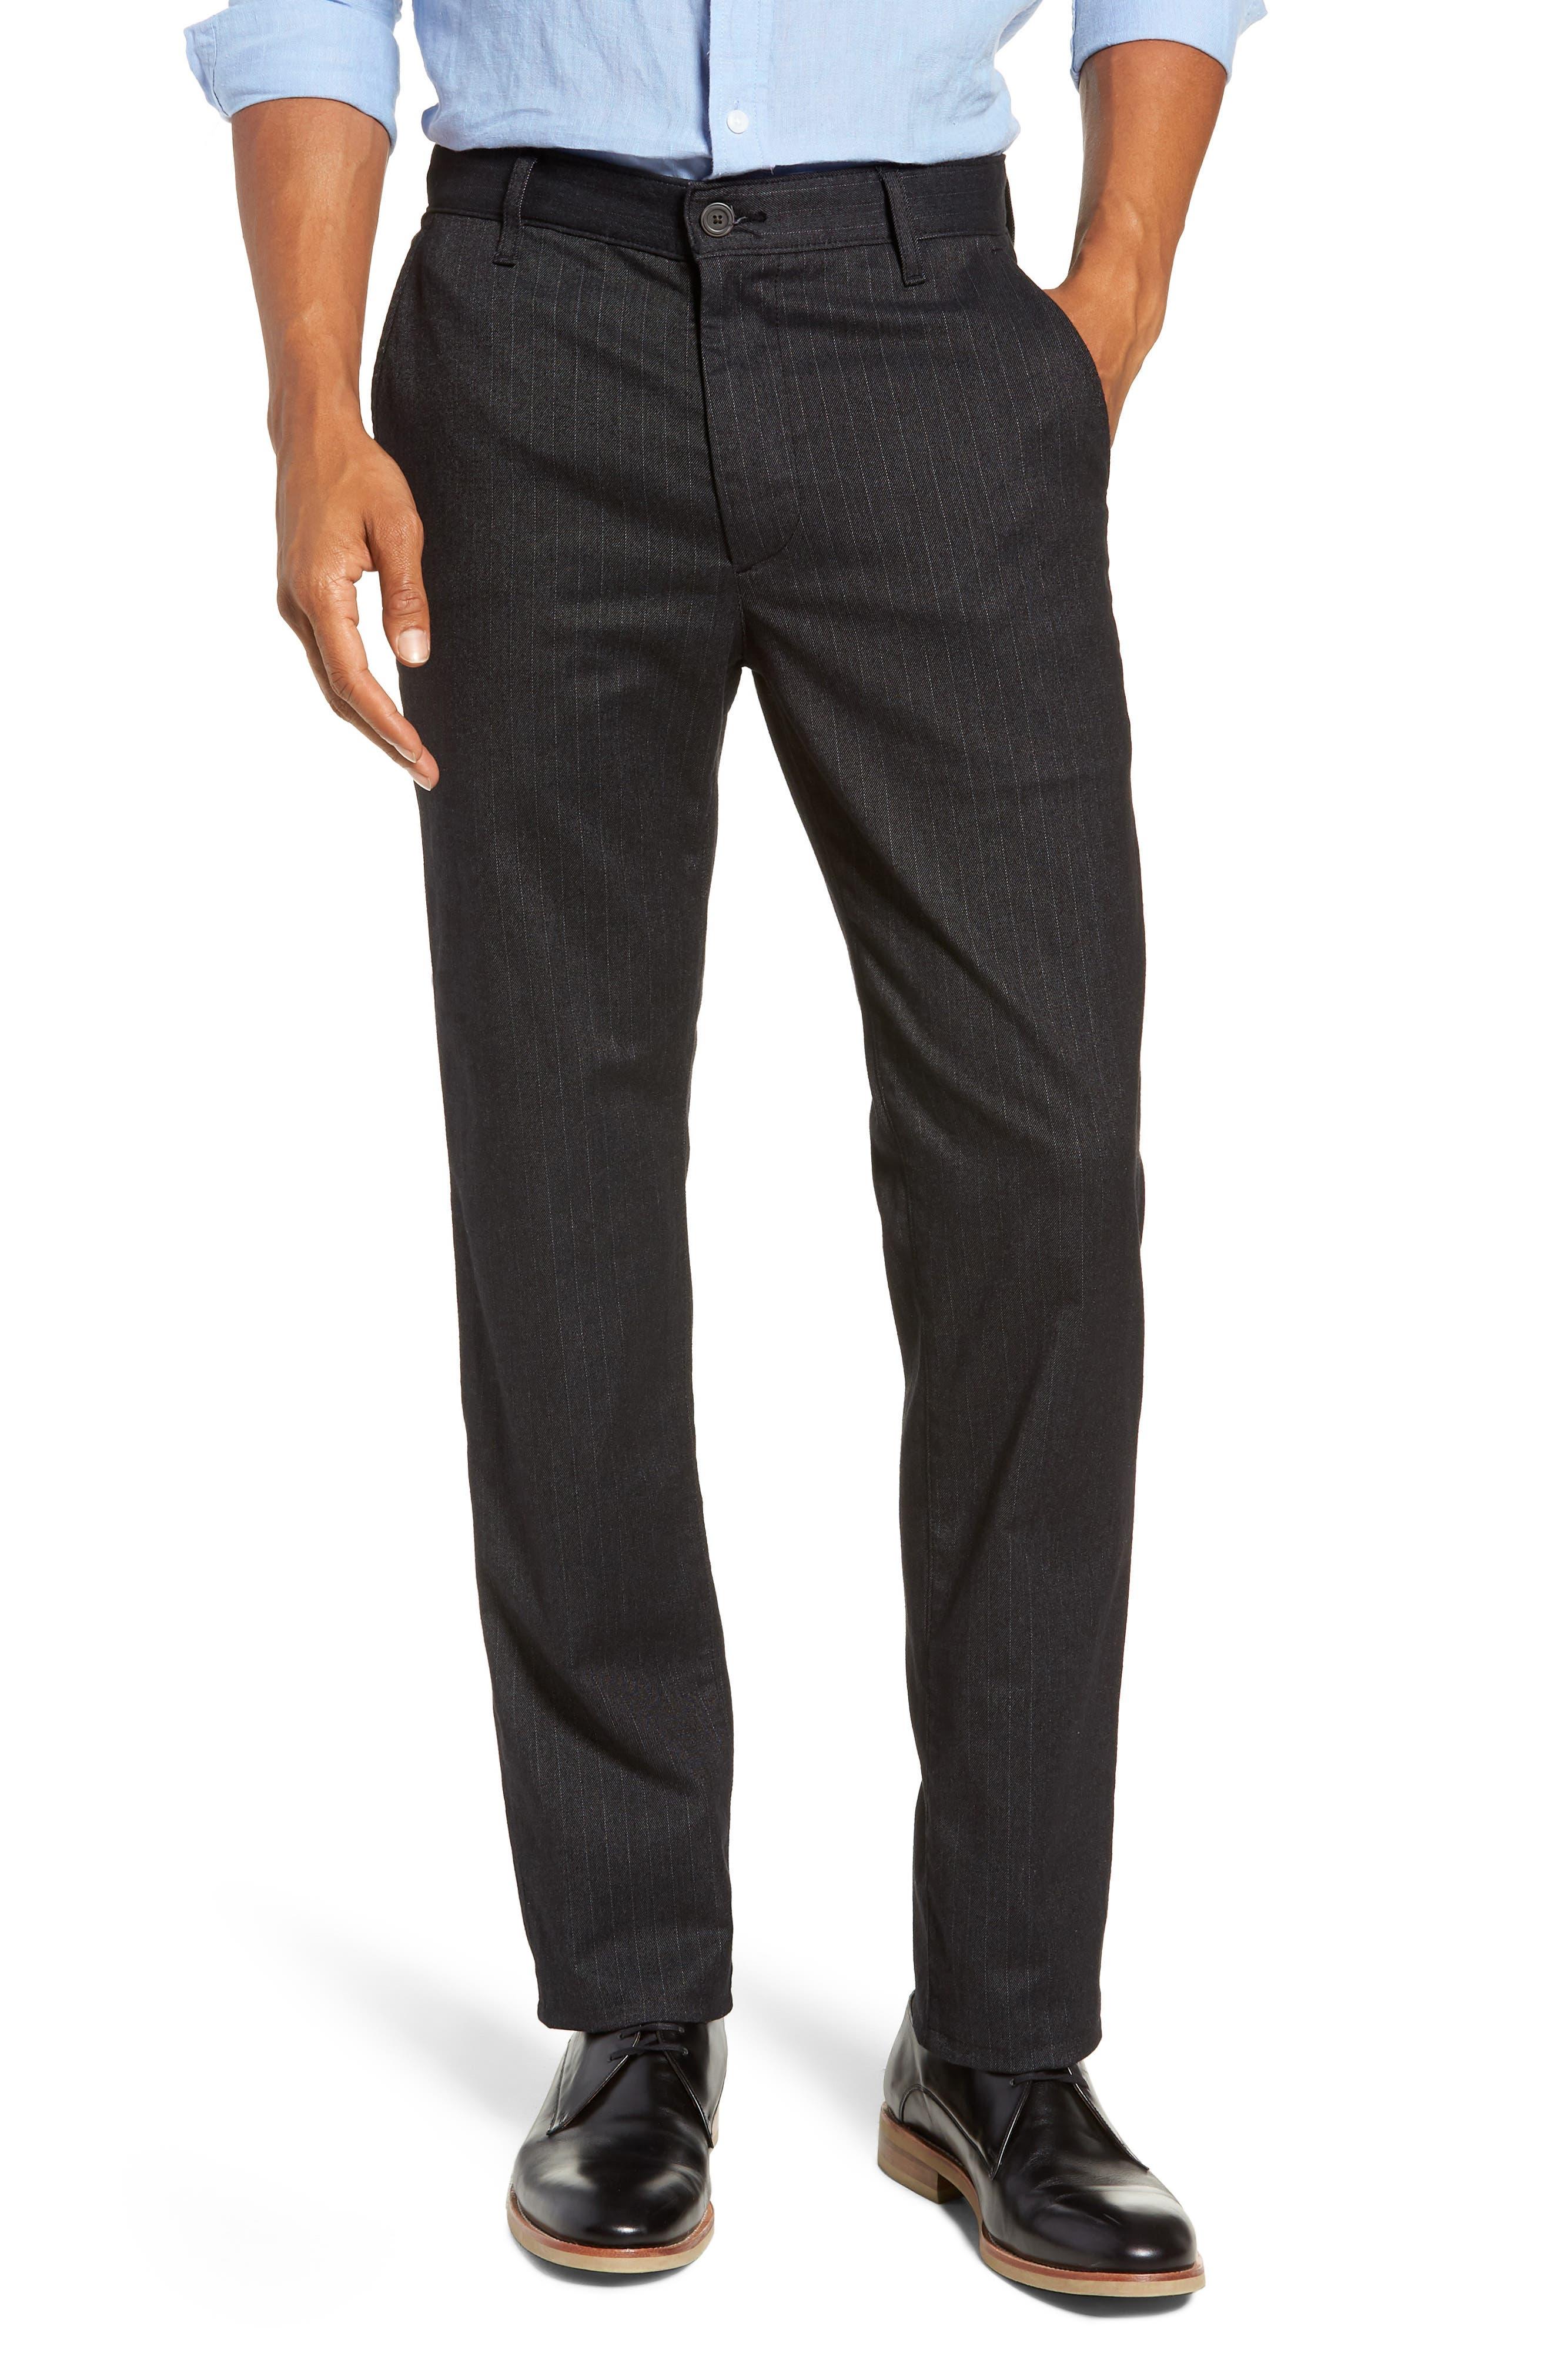 Marshall Slim Fit Pinstripe Pants,                         Main,                         color, HEATHERED MELANGE BLACK